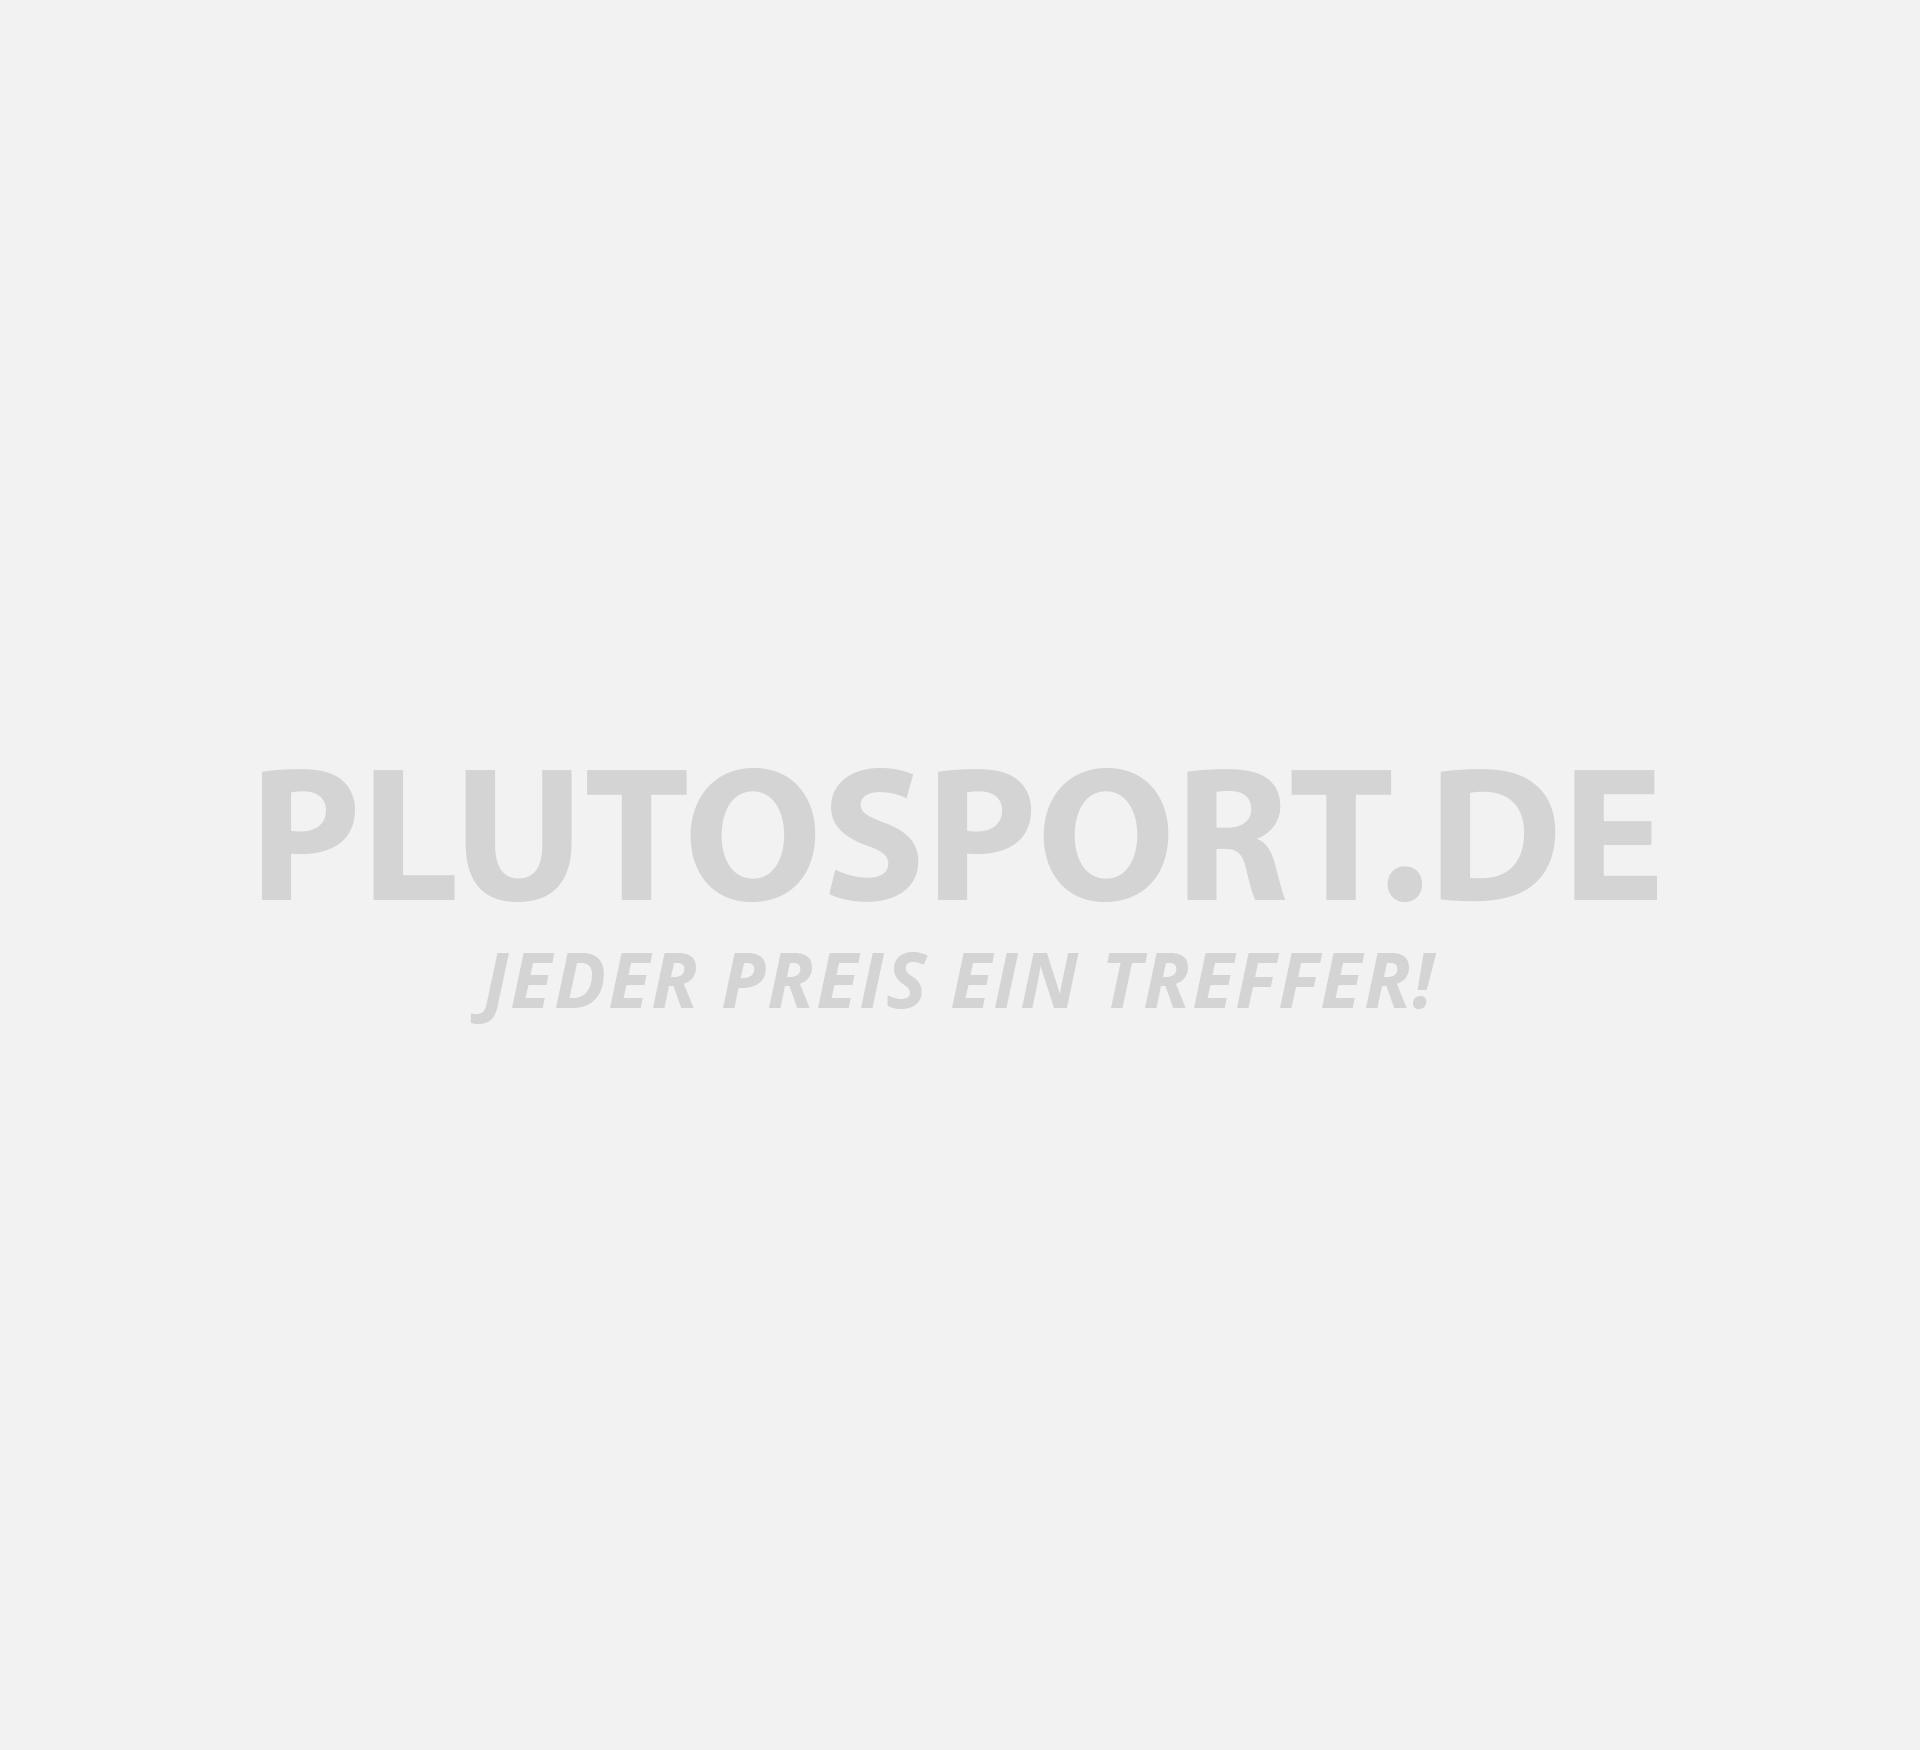 Ic Nike Vapor Mercurialx Xii Pro Neymar qMVSUzpG